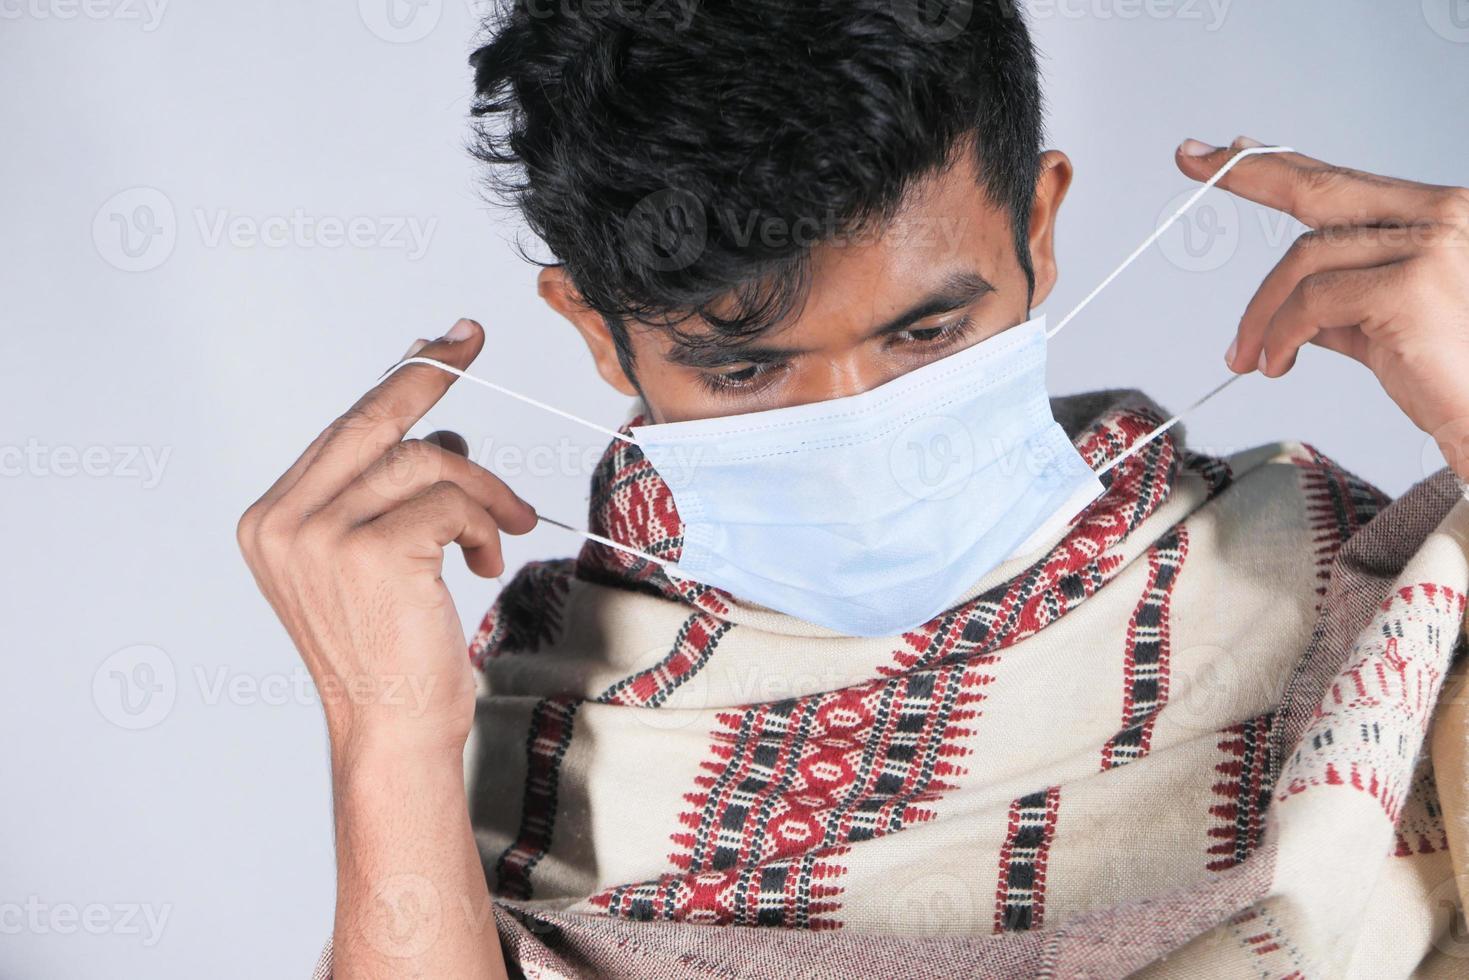 ung man sätter kirurgisk ansiktsmask på foto